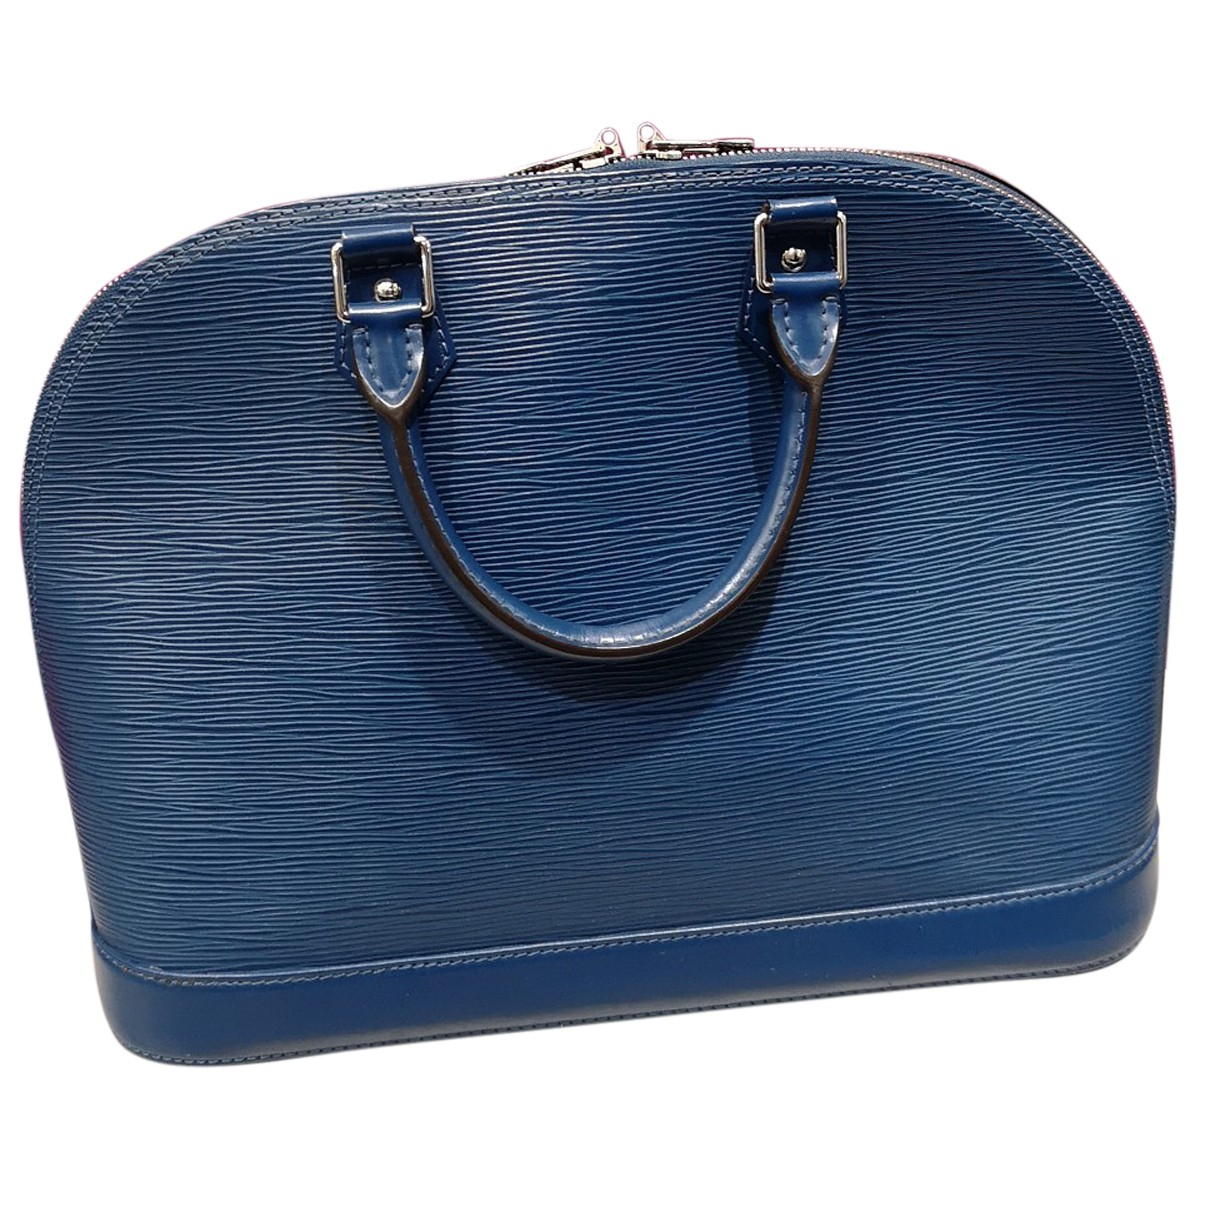 Louis Vuitton - Sac a main Alma pour femme en cuir - bleu